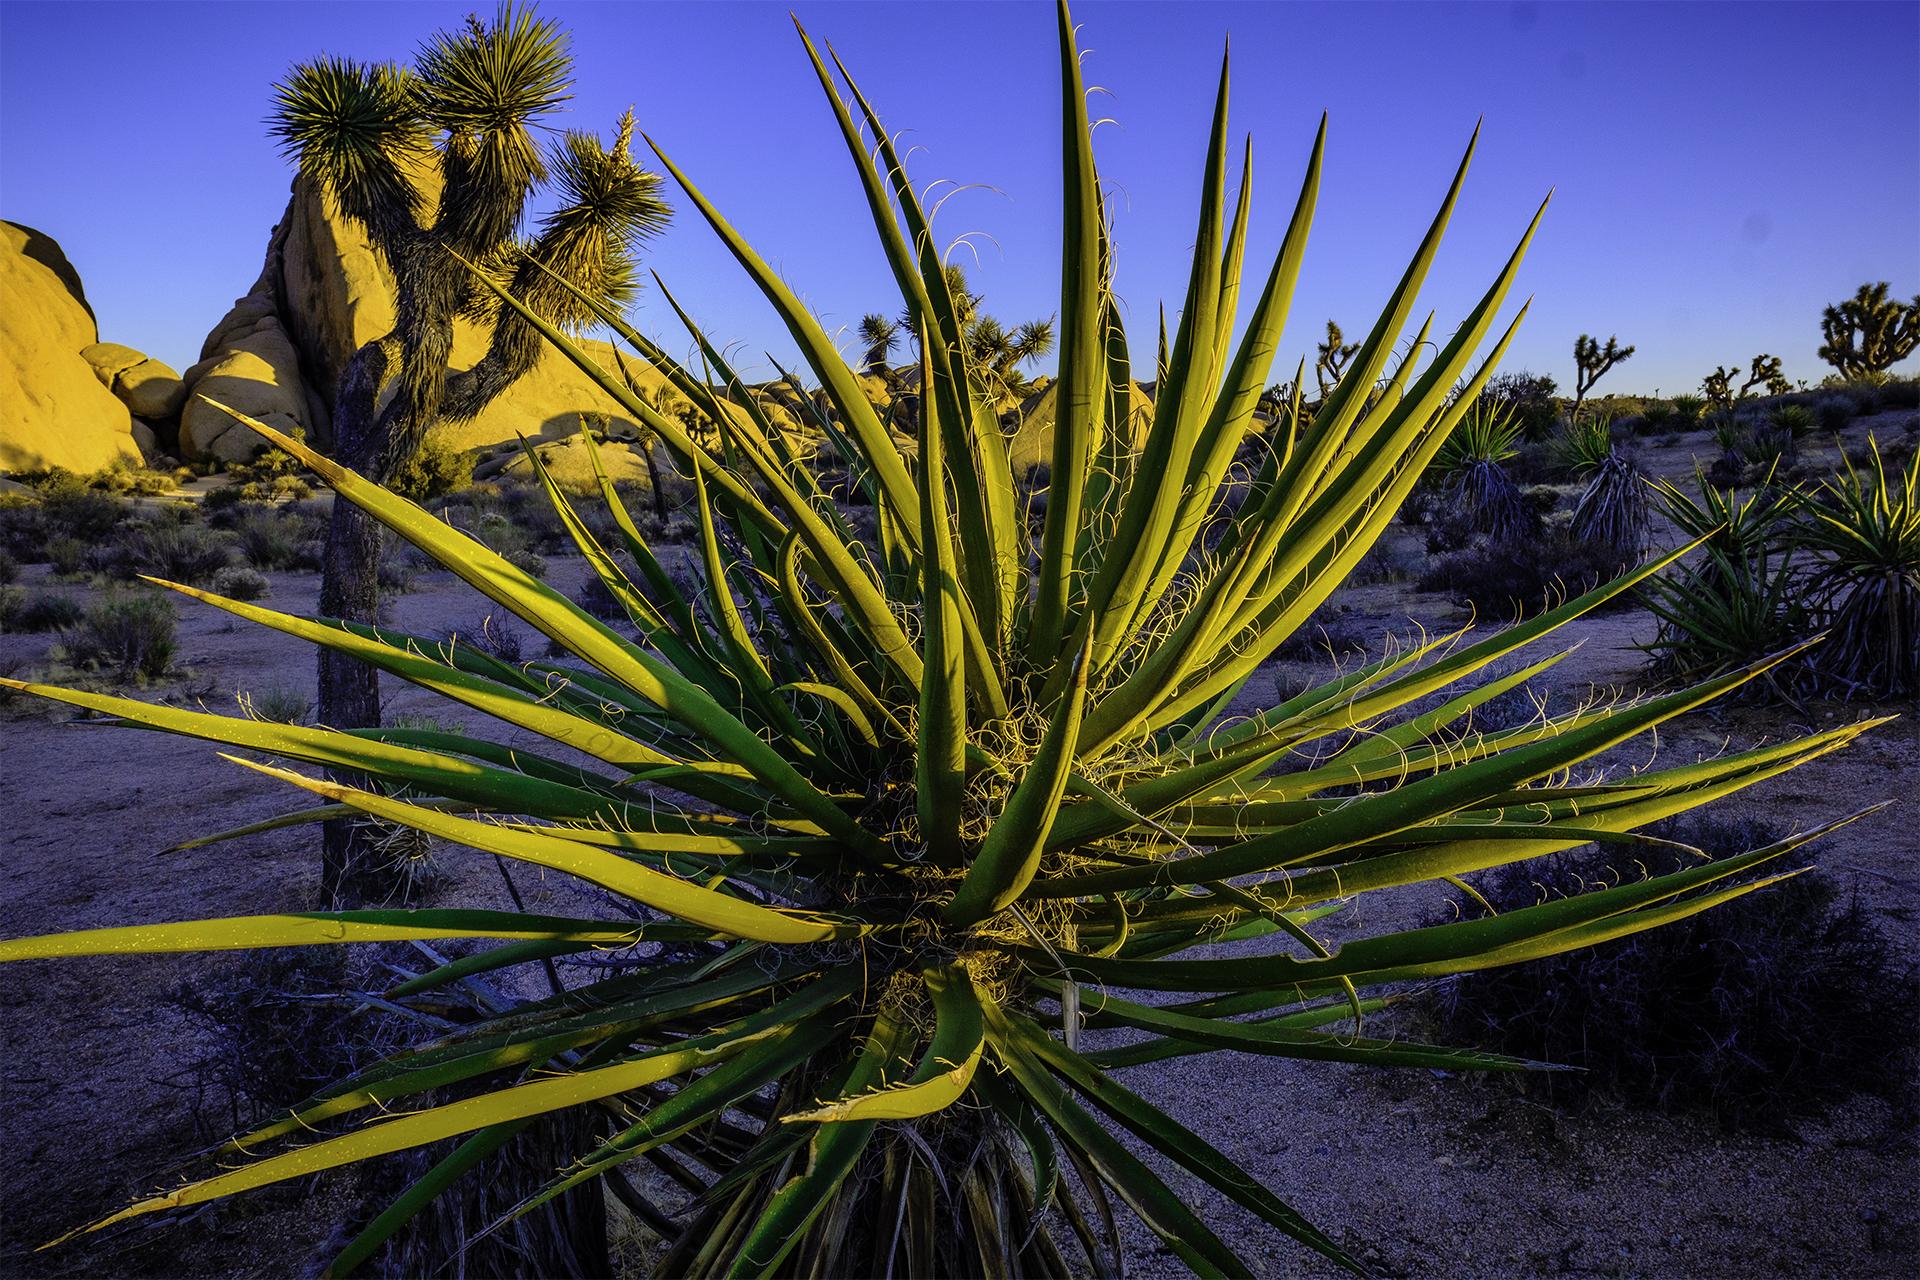 Succulent and Joshua trees at Joshua Tree National Park